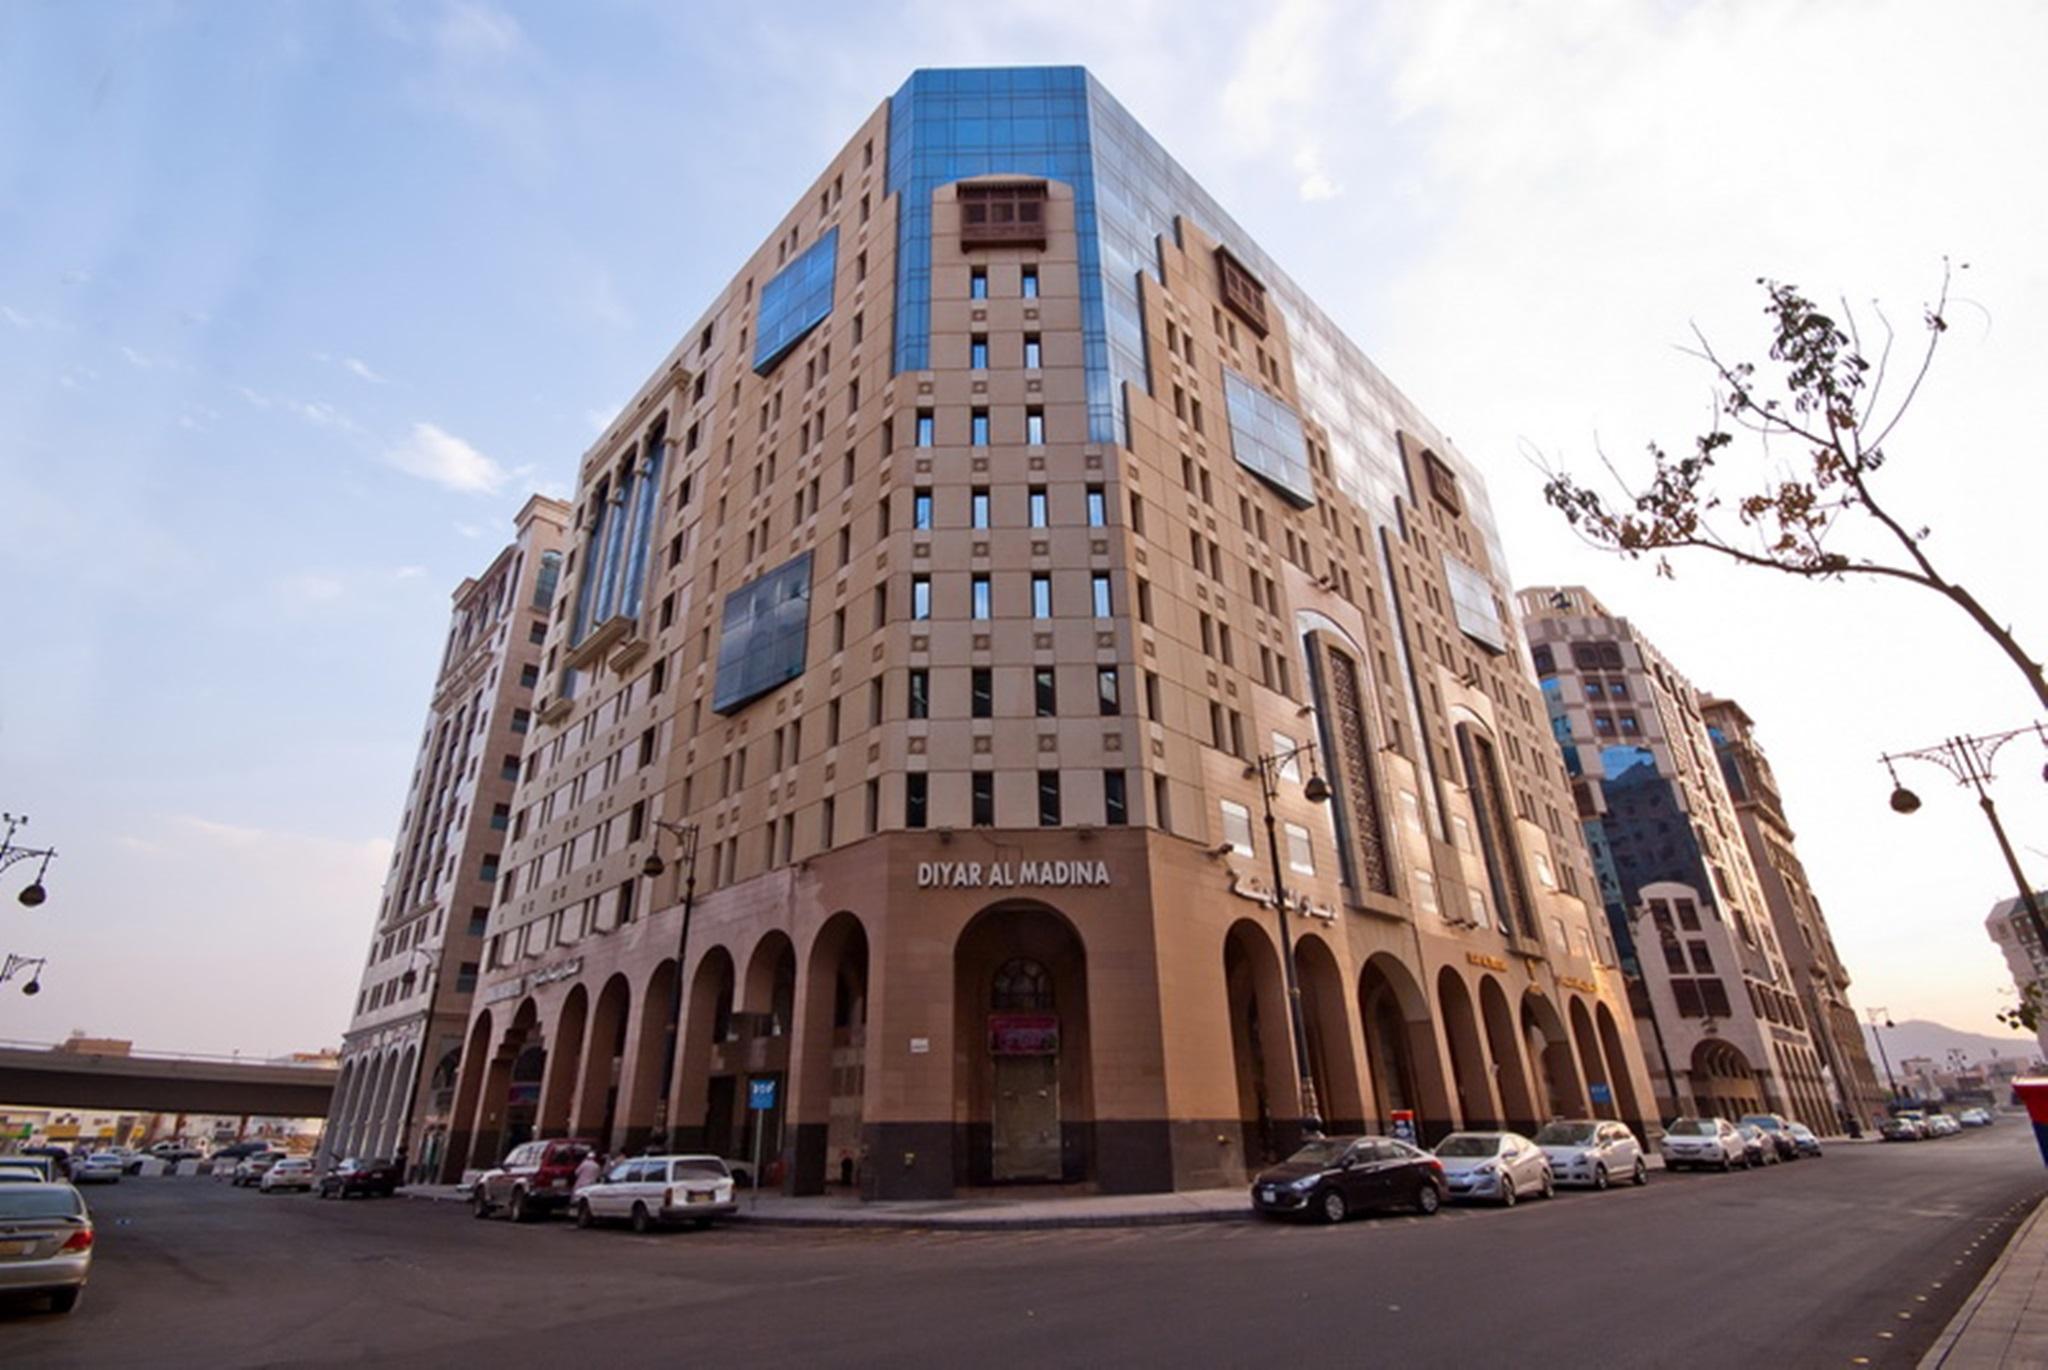 Diyar Al Madinah Hotel